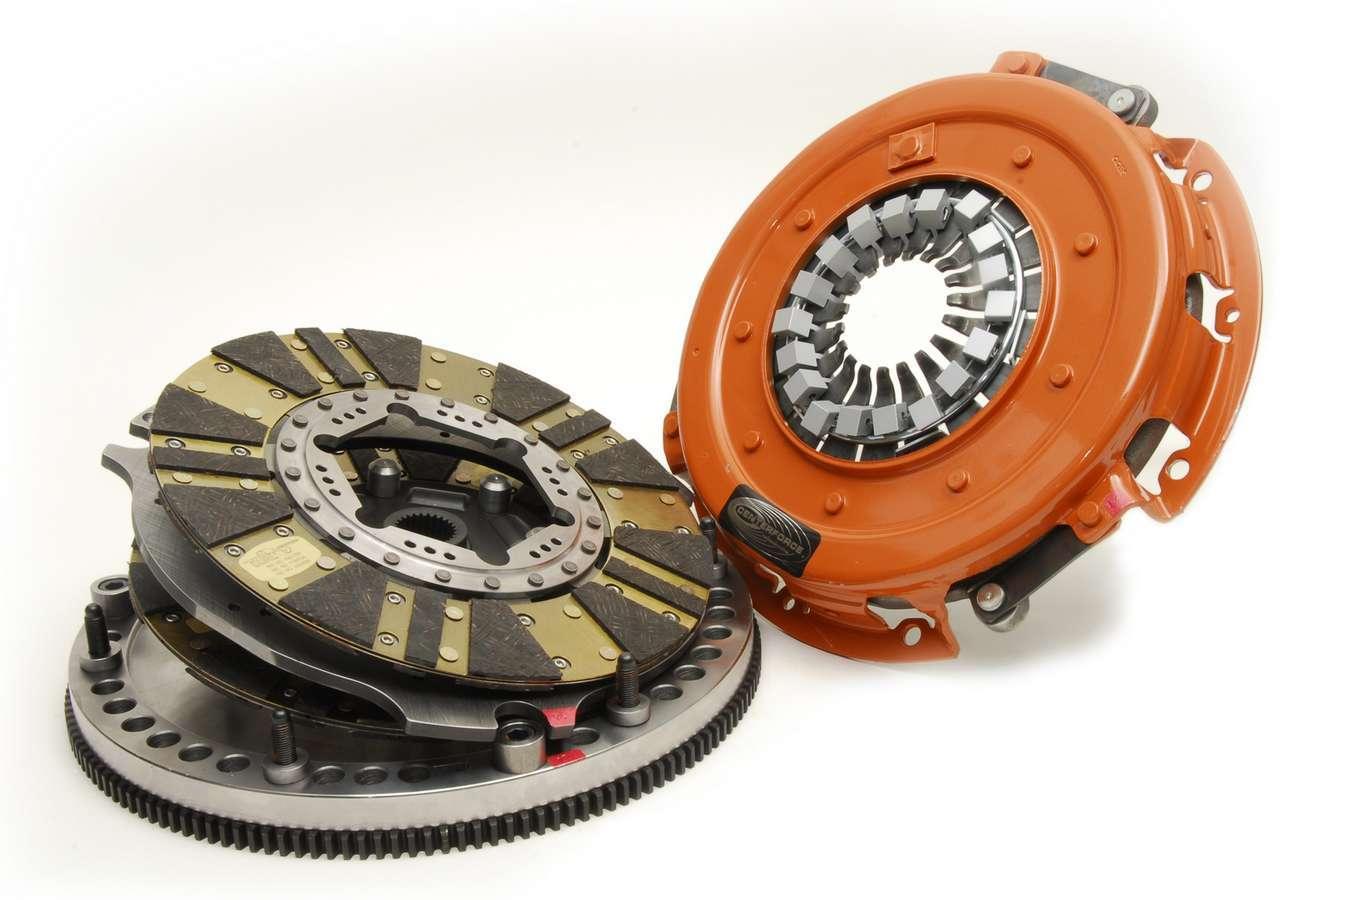 Centerforce 04614800 Clutch Kit, DYAD, Twin Disc, 10-1/2 in Diameter, 1-1/8 in x 26 Spline, Sprung Hub, Flywheel, Organic, 2 Piece Seal, GM V8, Kit